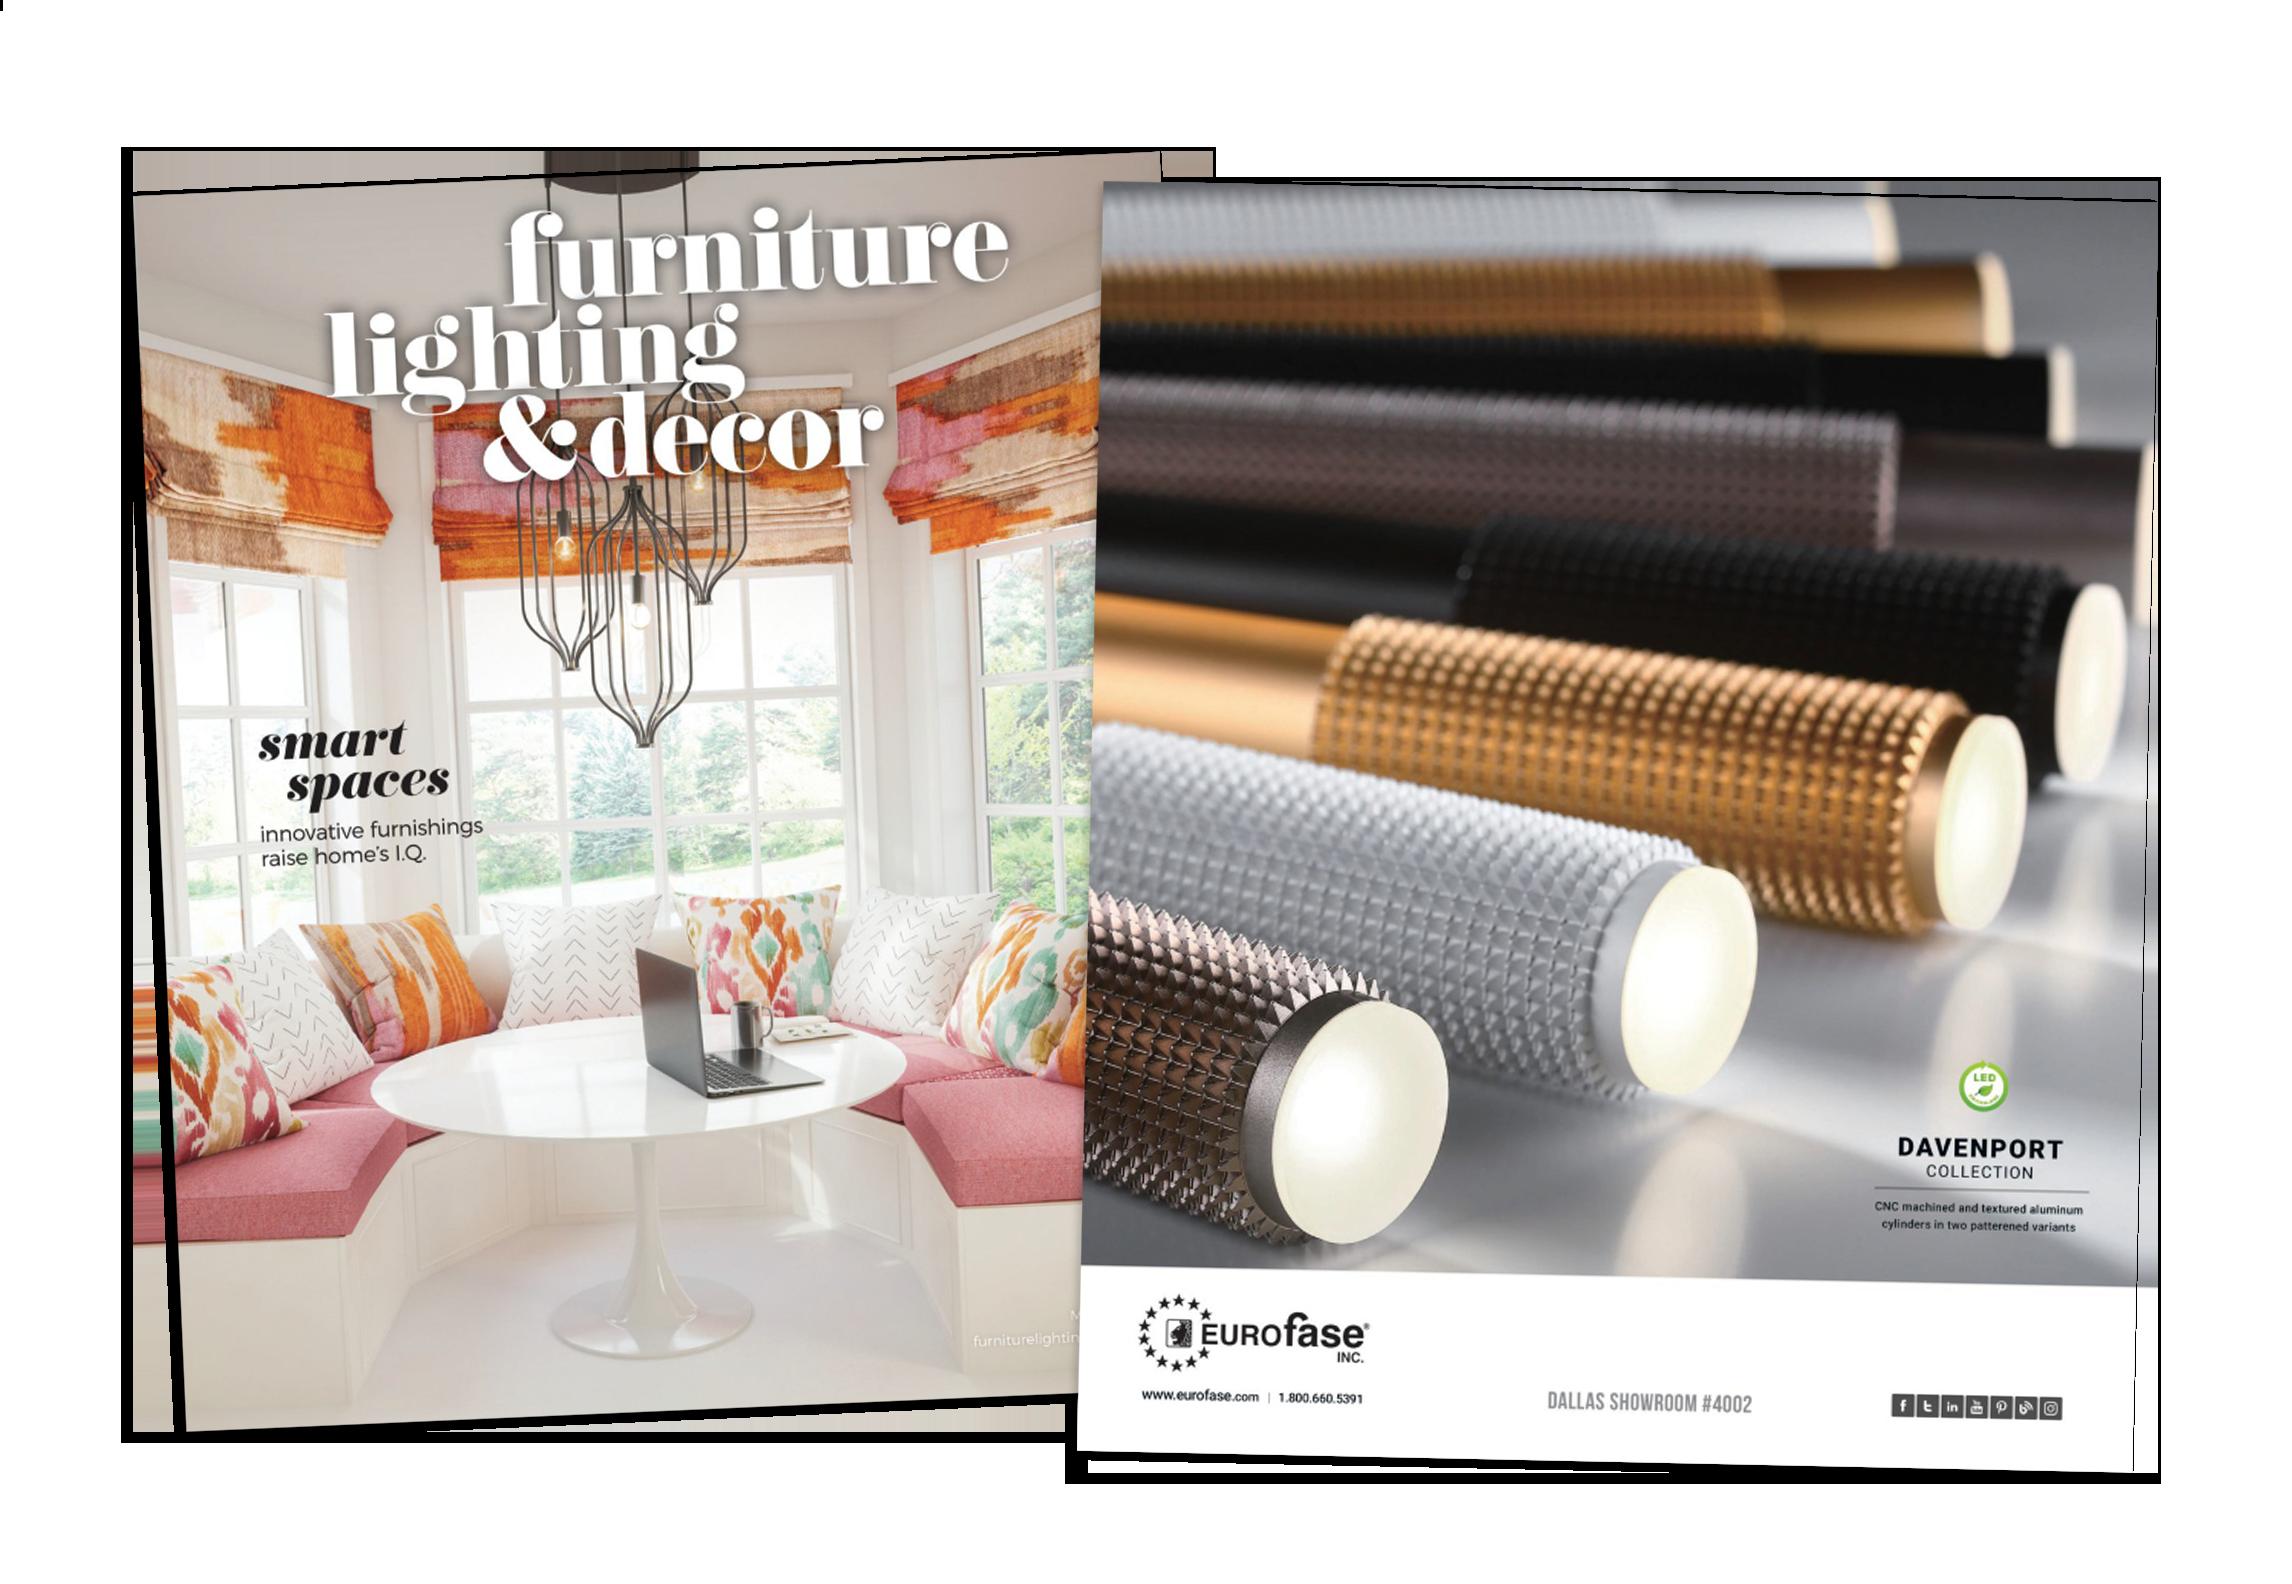 Furniture Lighting Decor March 2019 Ad Interiordesign